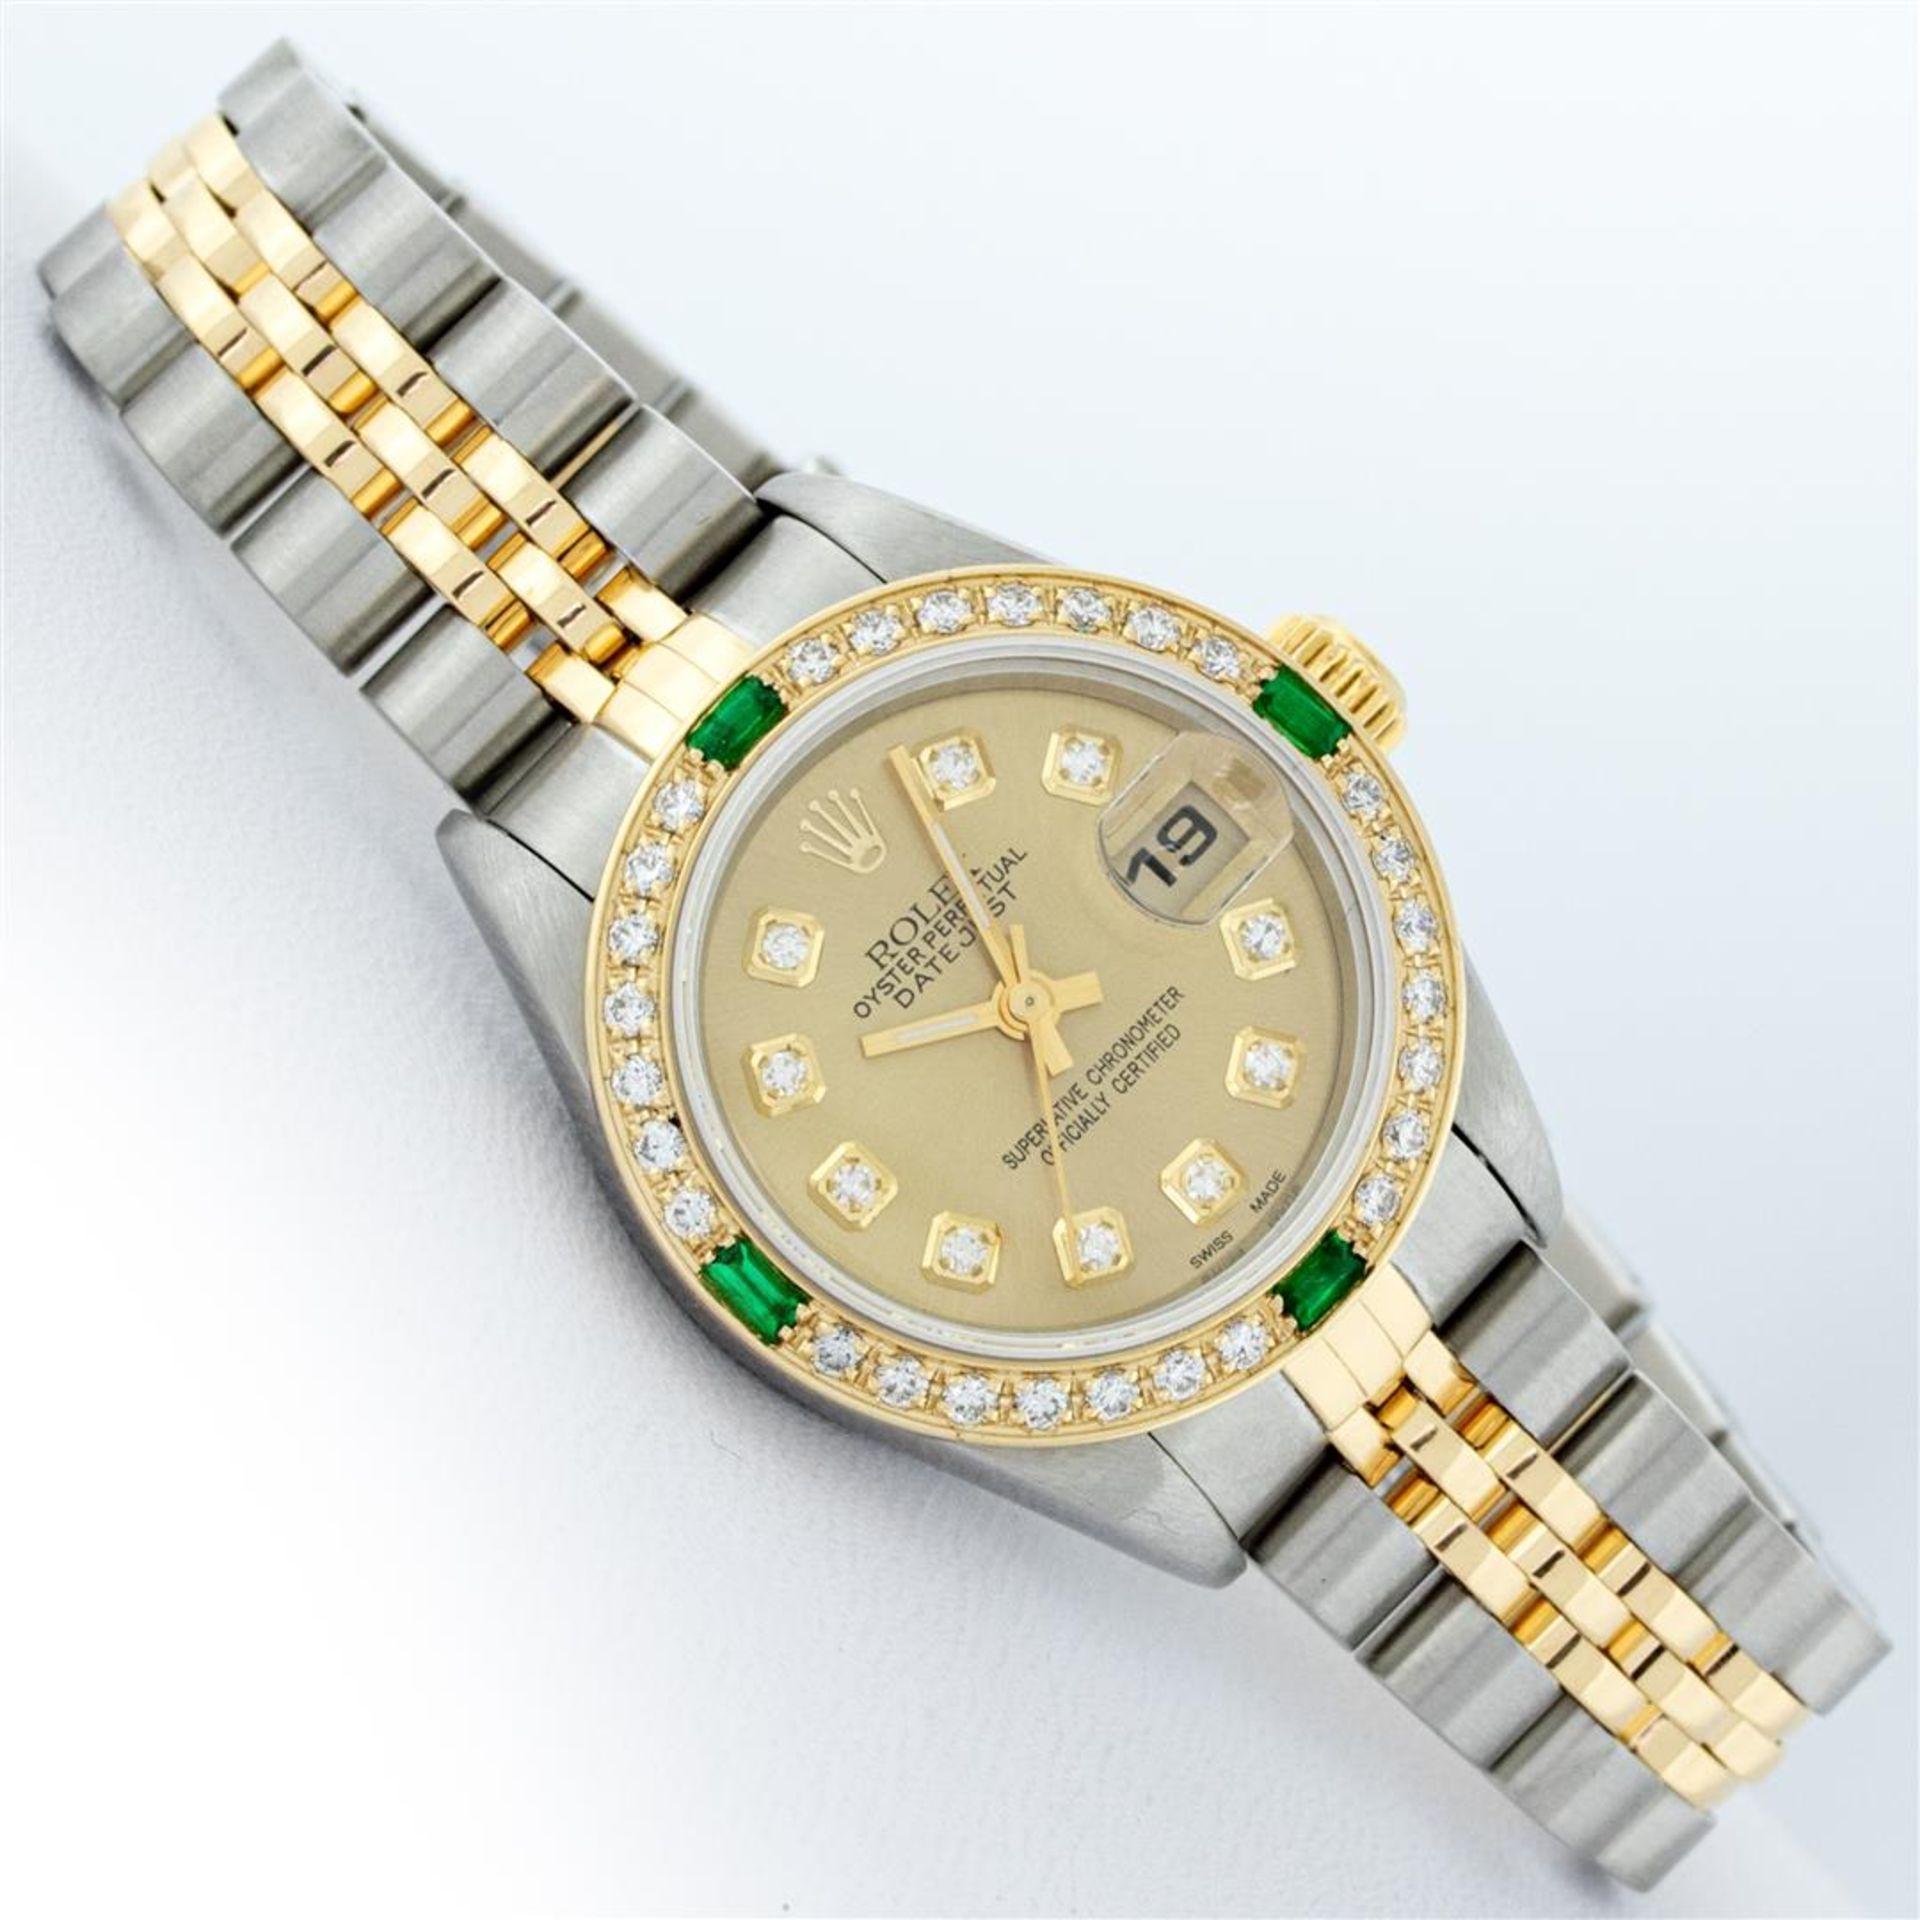 Rolex Ladies 2 Tone 18K Quickset Champagne Diamond & Emerald Datejust Wristwatch - Image 3 of 9